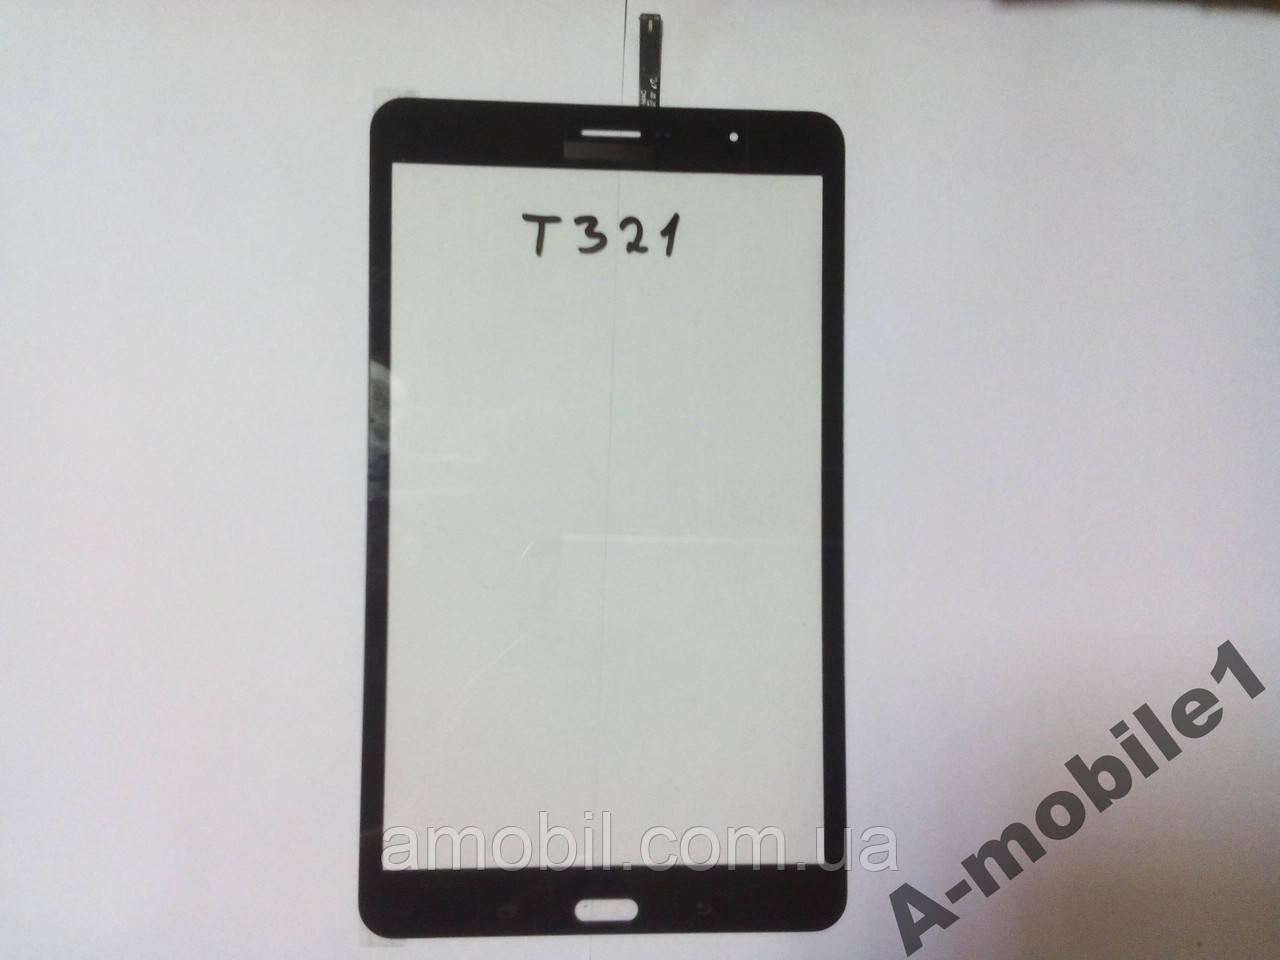 Сенсор Samsung T321 T325 Galaxy Tab Pro 8.4 3G orig в наличии